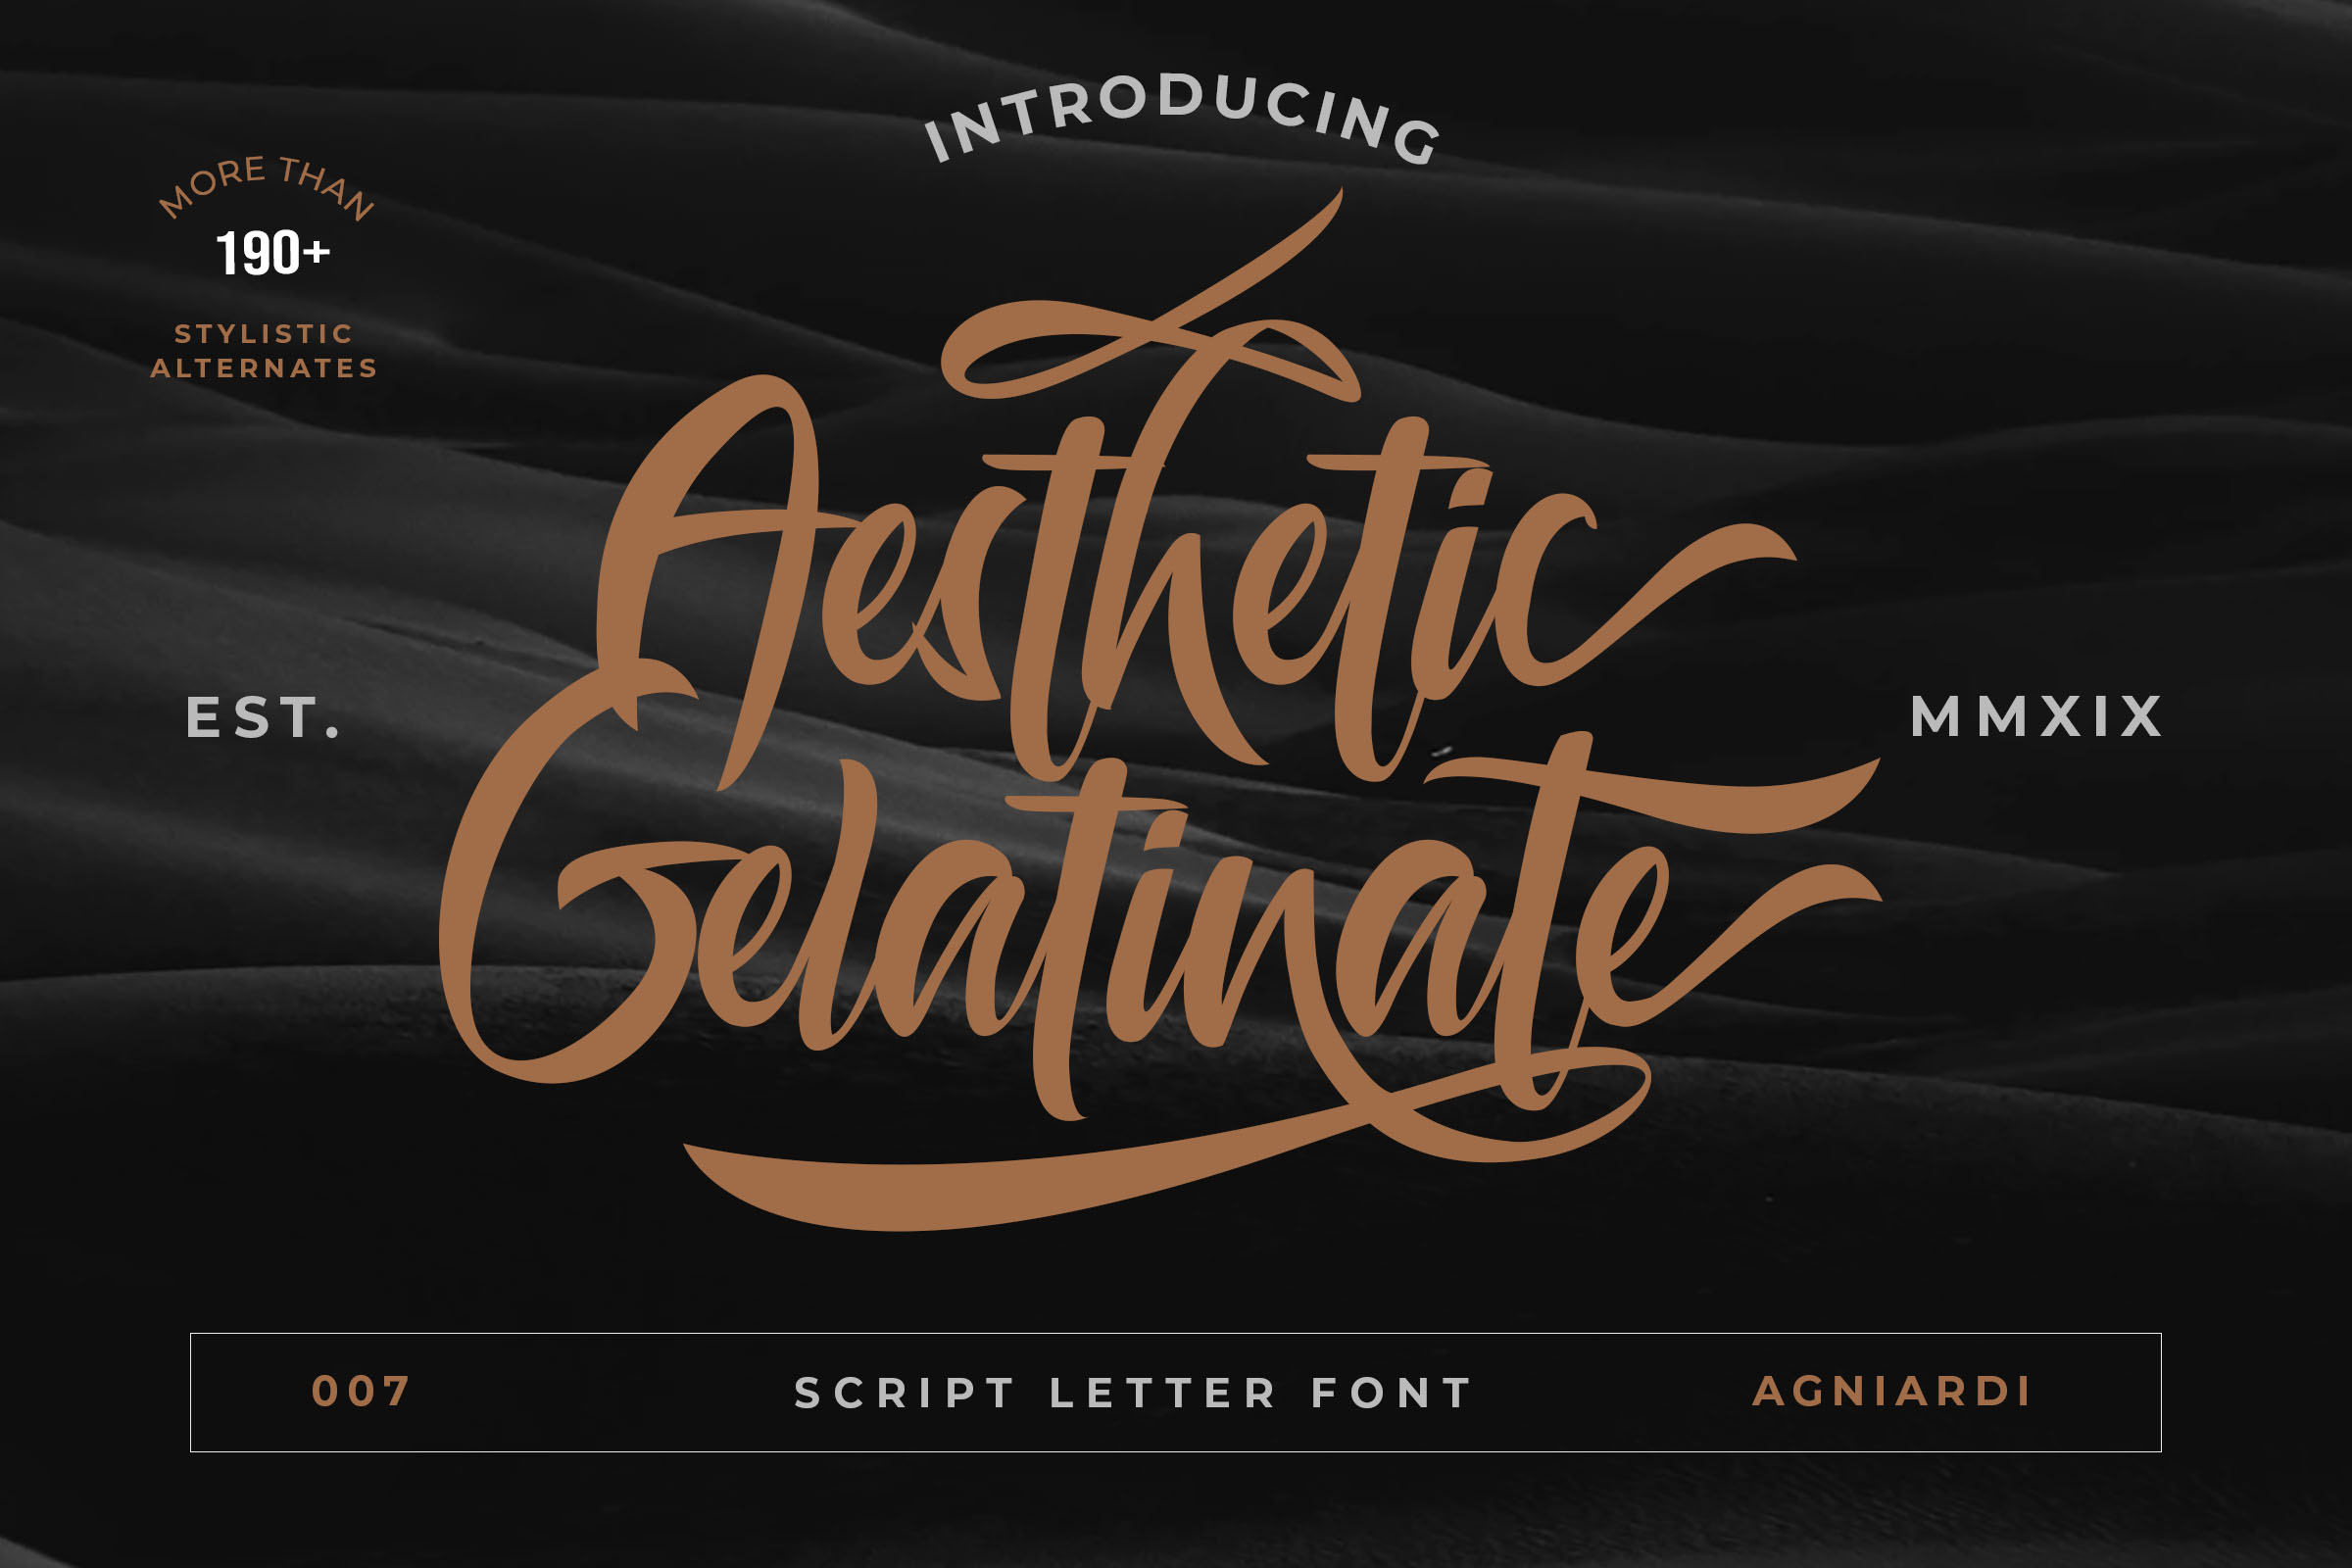 Aesthetic Gelatinato – Free Fonts, Script & handwritten